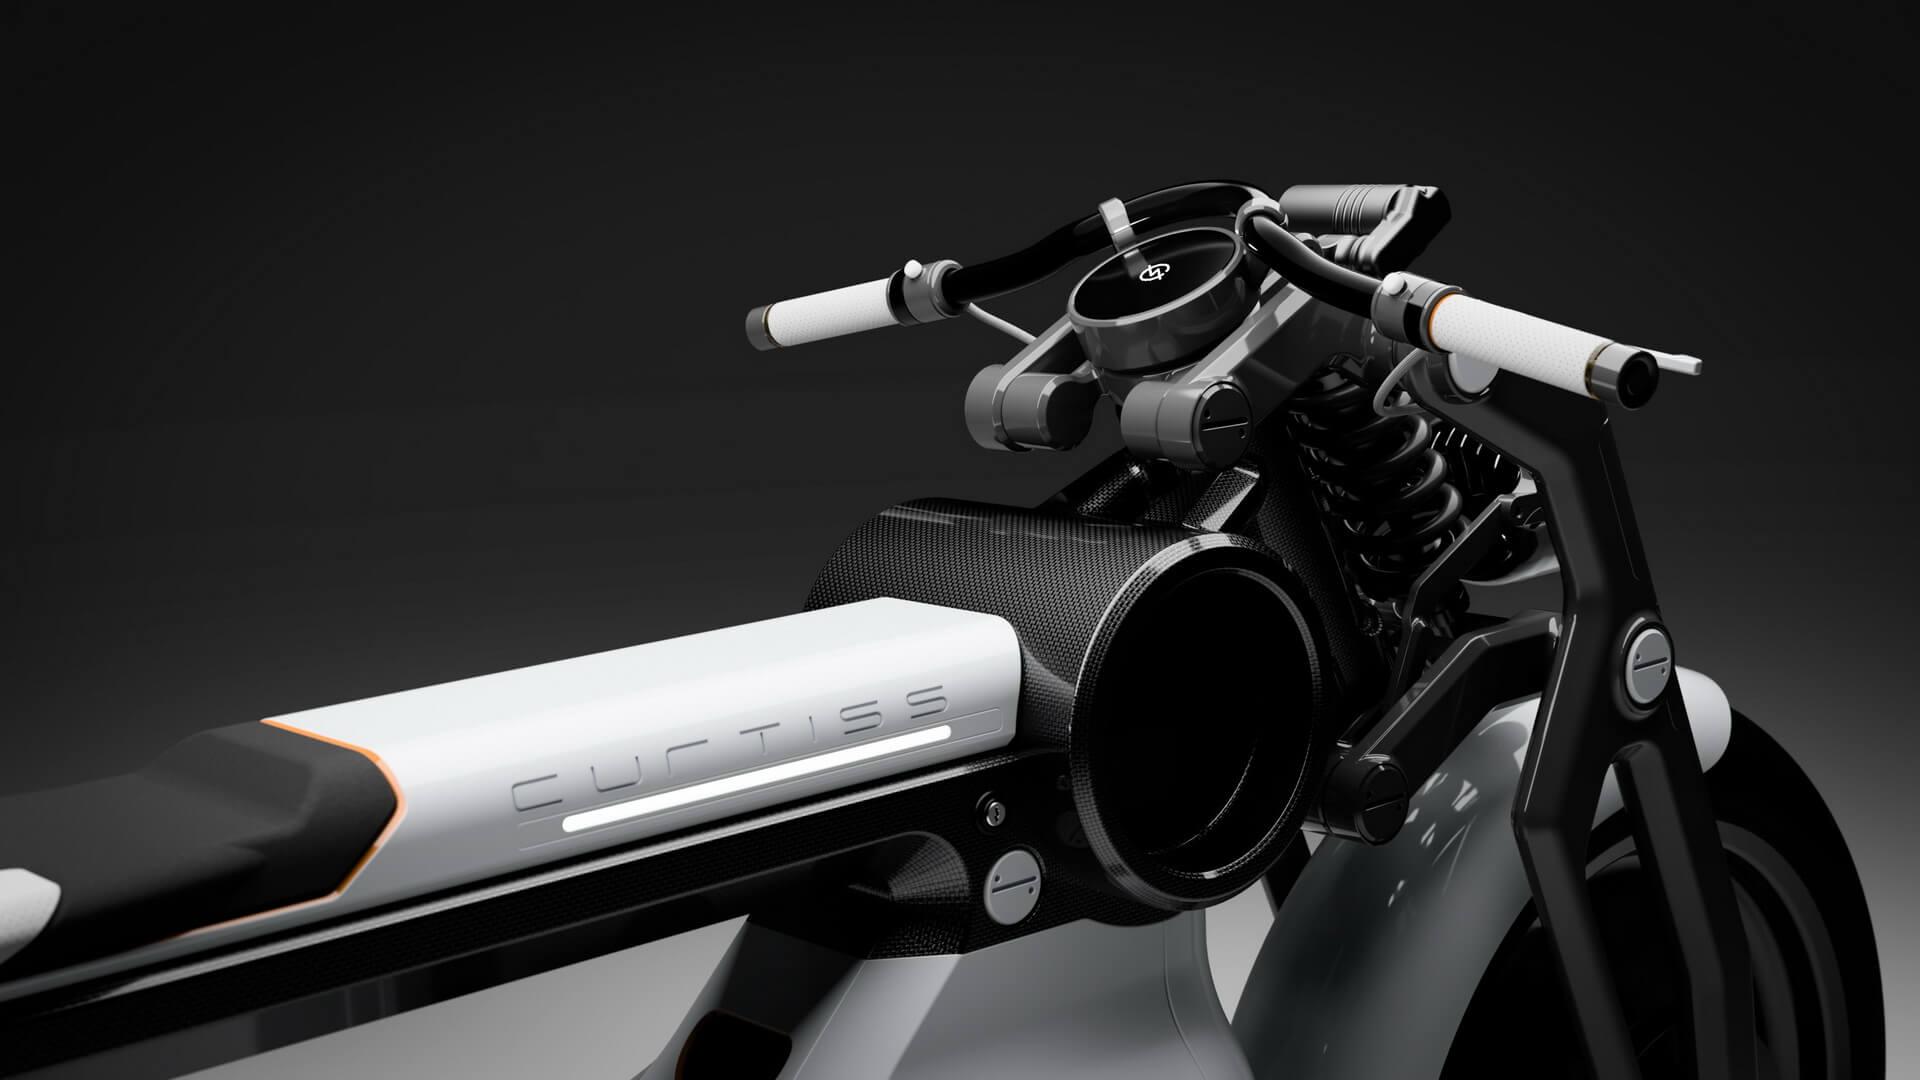 Электрический мотоцикл Zeus Cafe - фото 2